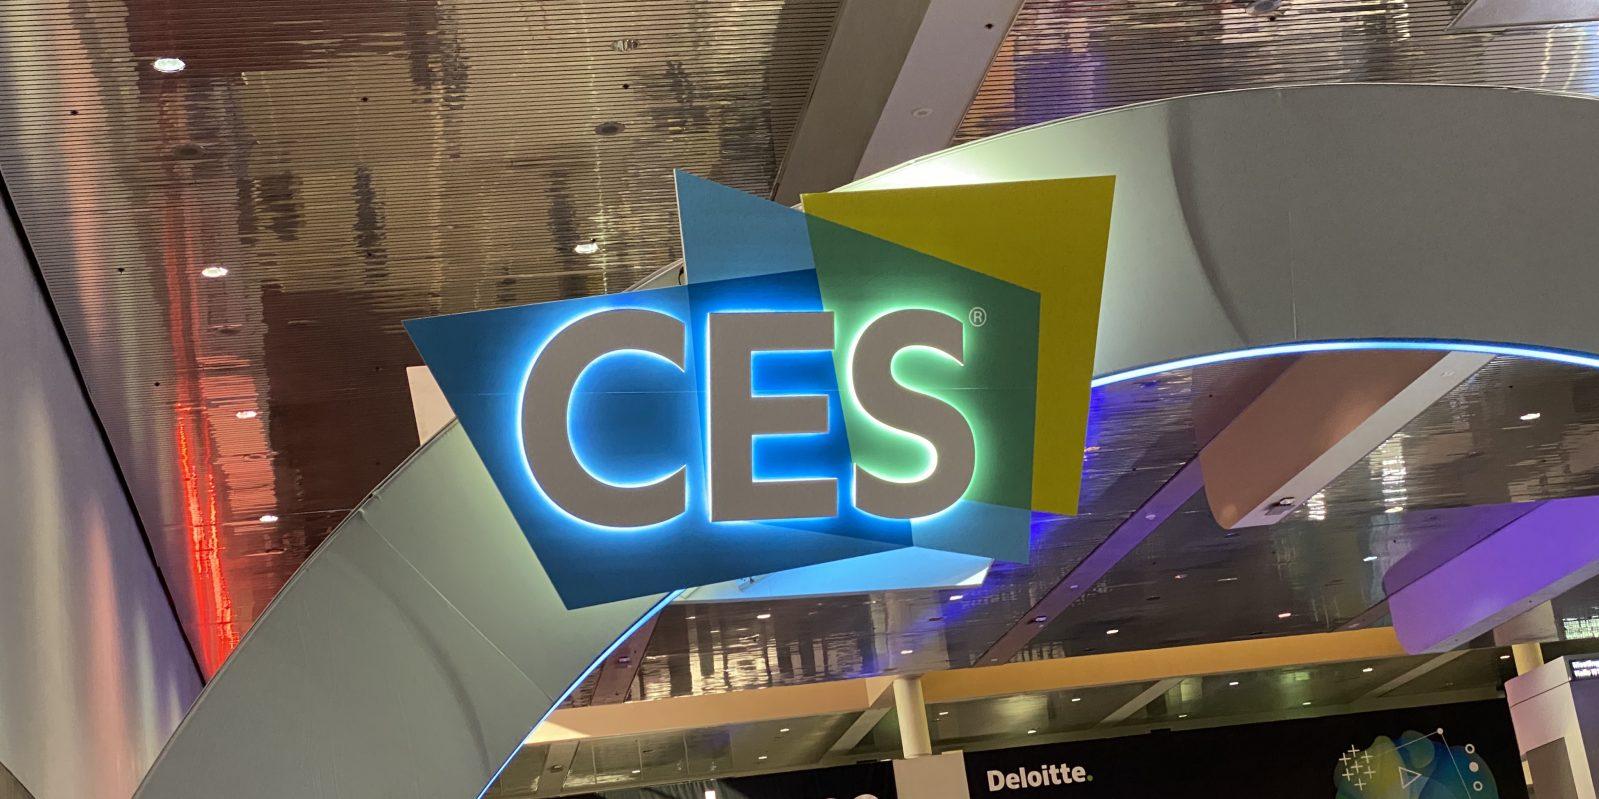 CES Roundup: Upcoming Apple accessories including HomeKit, CarPlay, iPhone, iPad, Mac